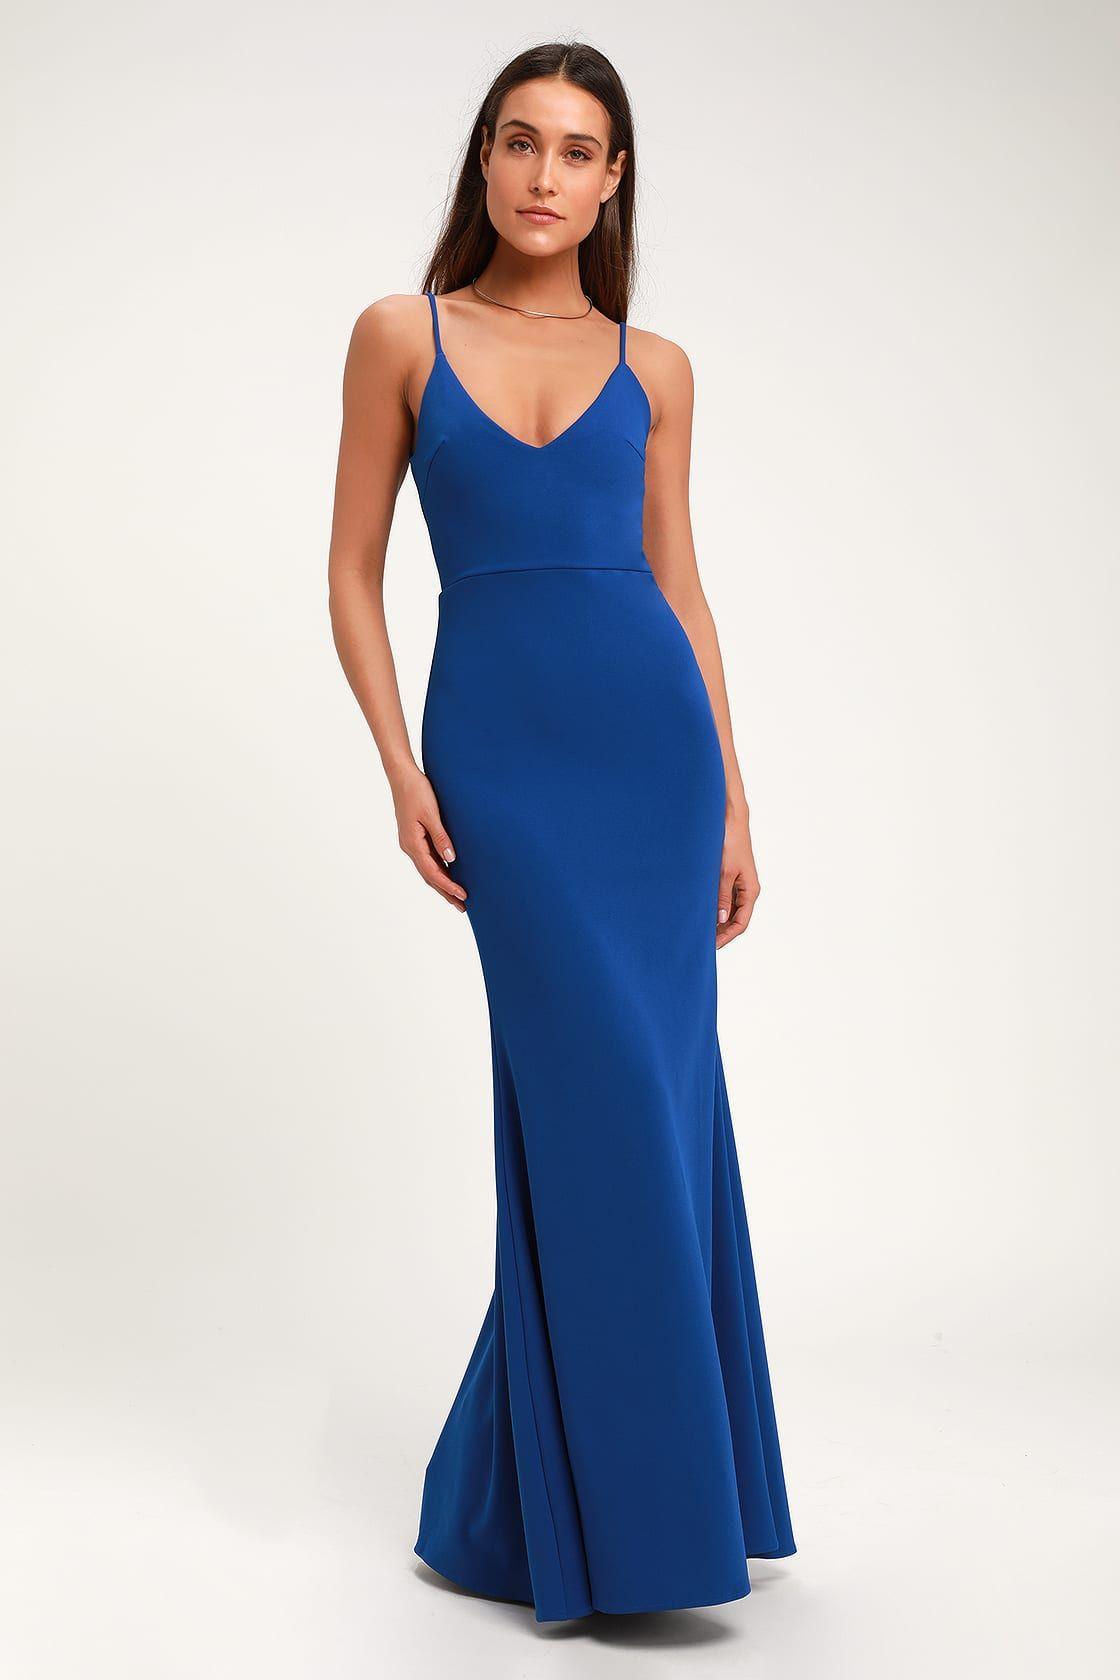 d85c939cc Infinite Glory Royal Blue Maxi Dress. Sexy Royal Blue Maxi Dress - Mermaid  Maxi Dress - Bodycon Maxi Forest Green ...